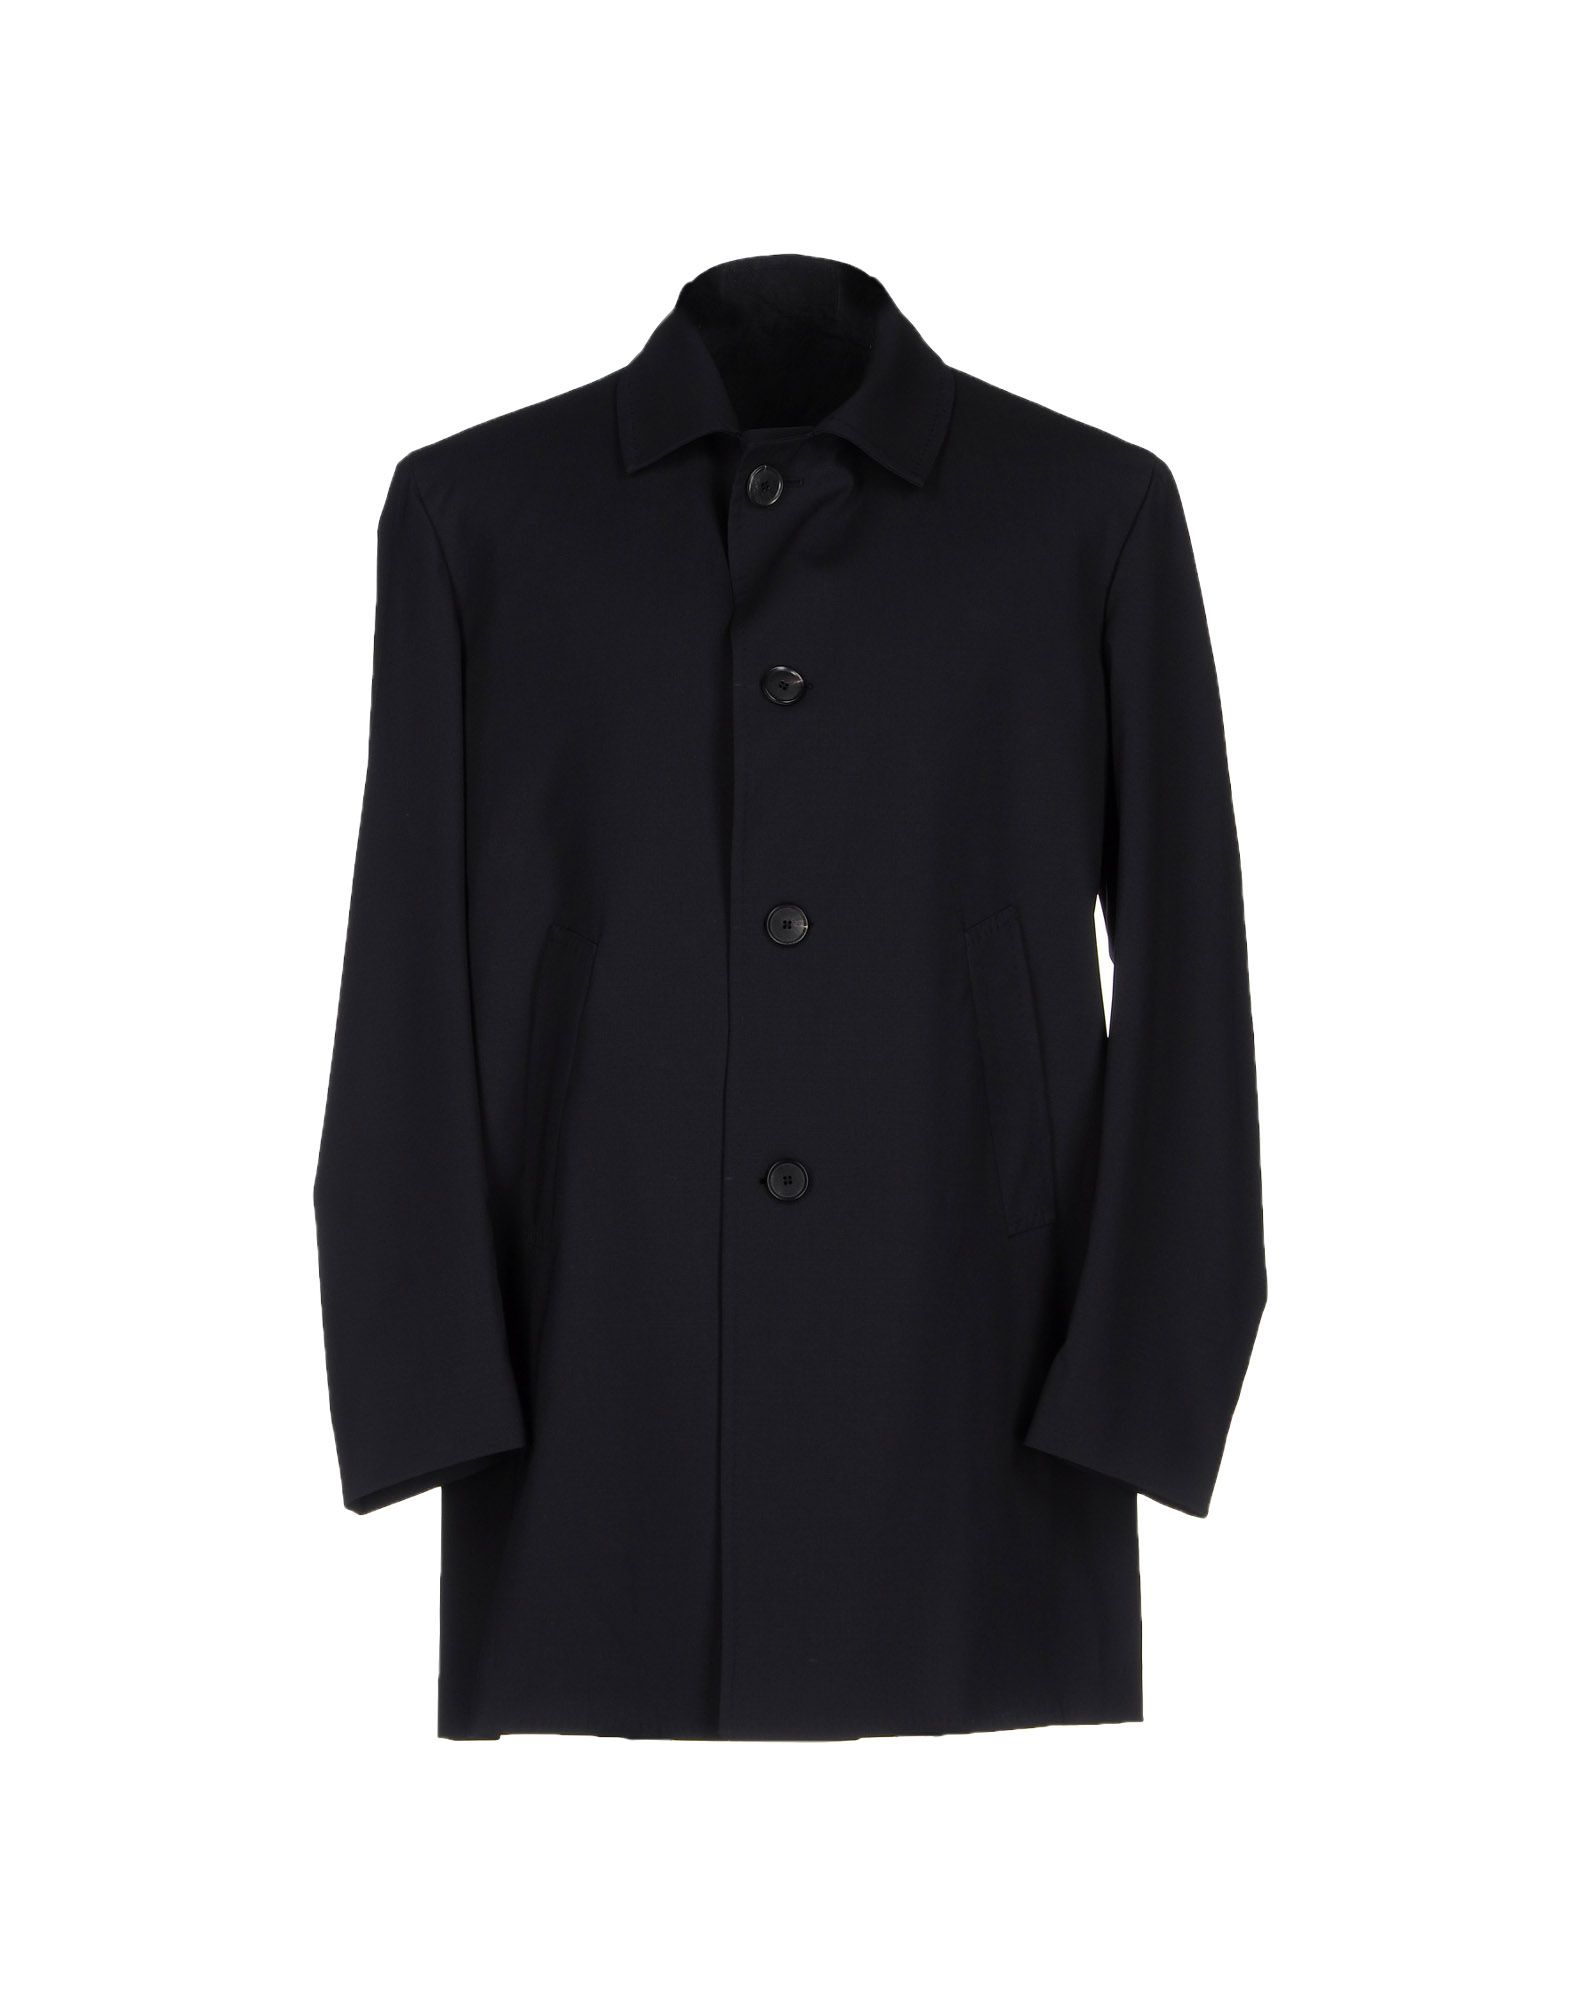 SALVATORE PICCOLO Full-Length Jacket in Dark Blue